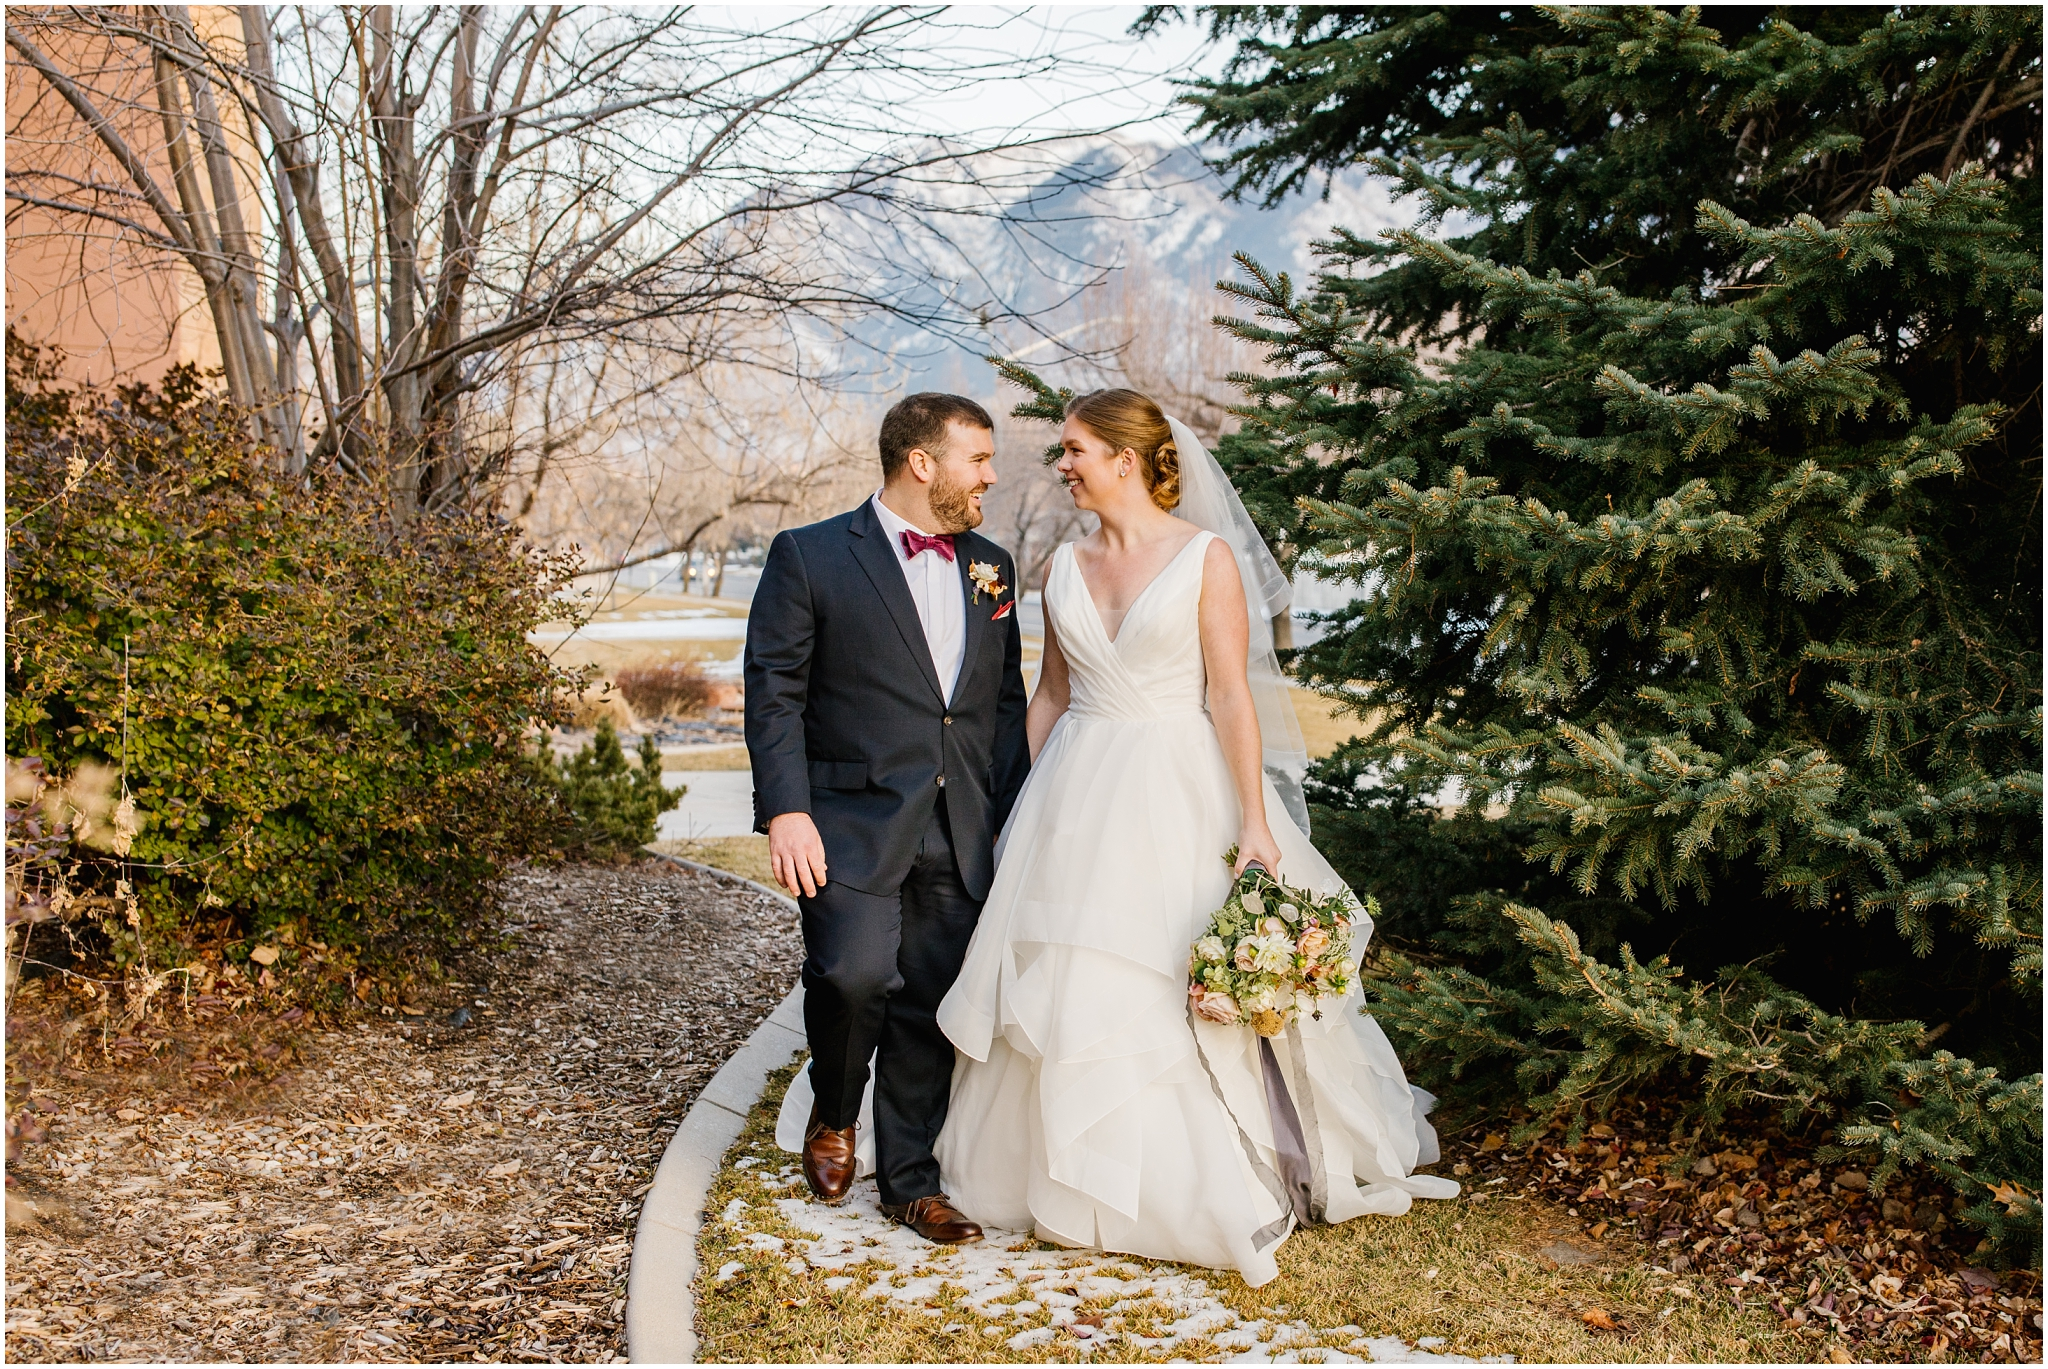 CN-Wedding-290_Lizzie-B-Imagery-Utah-Wedding-Photographer-Blessed-Sacrament-Catholic-Church-Sandy-Utah-The-Blended-Table-Salt-Lake-City.jpg